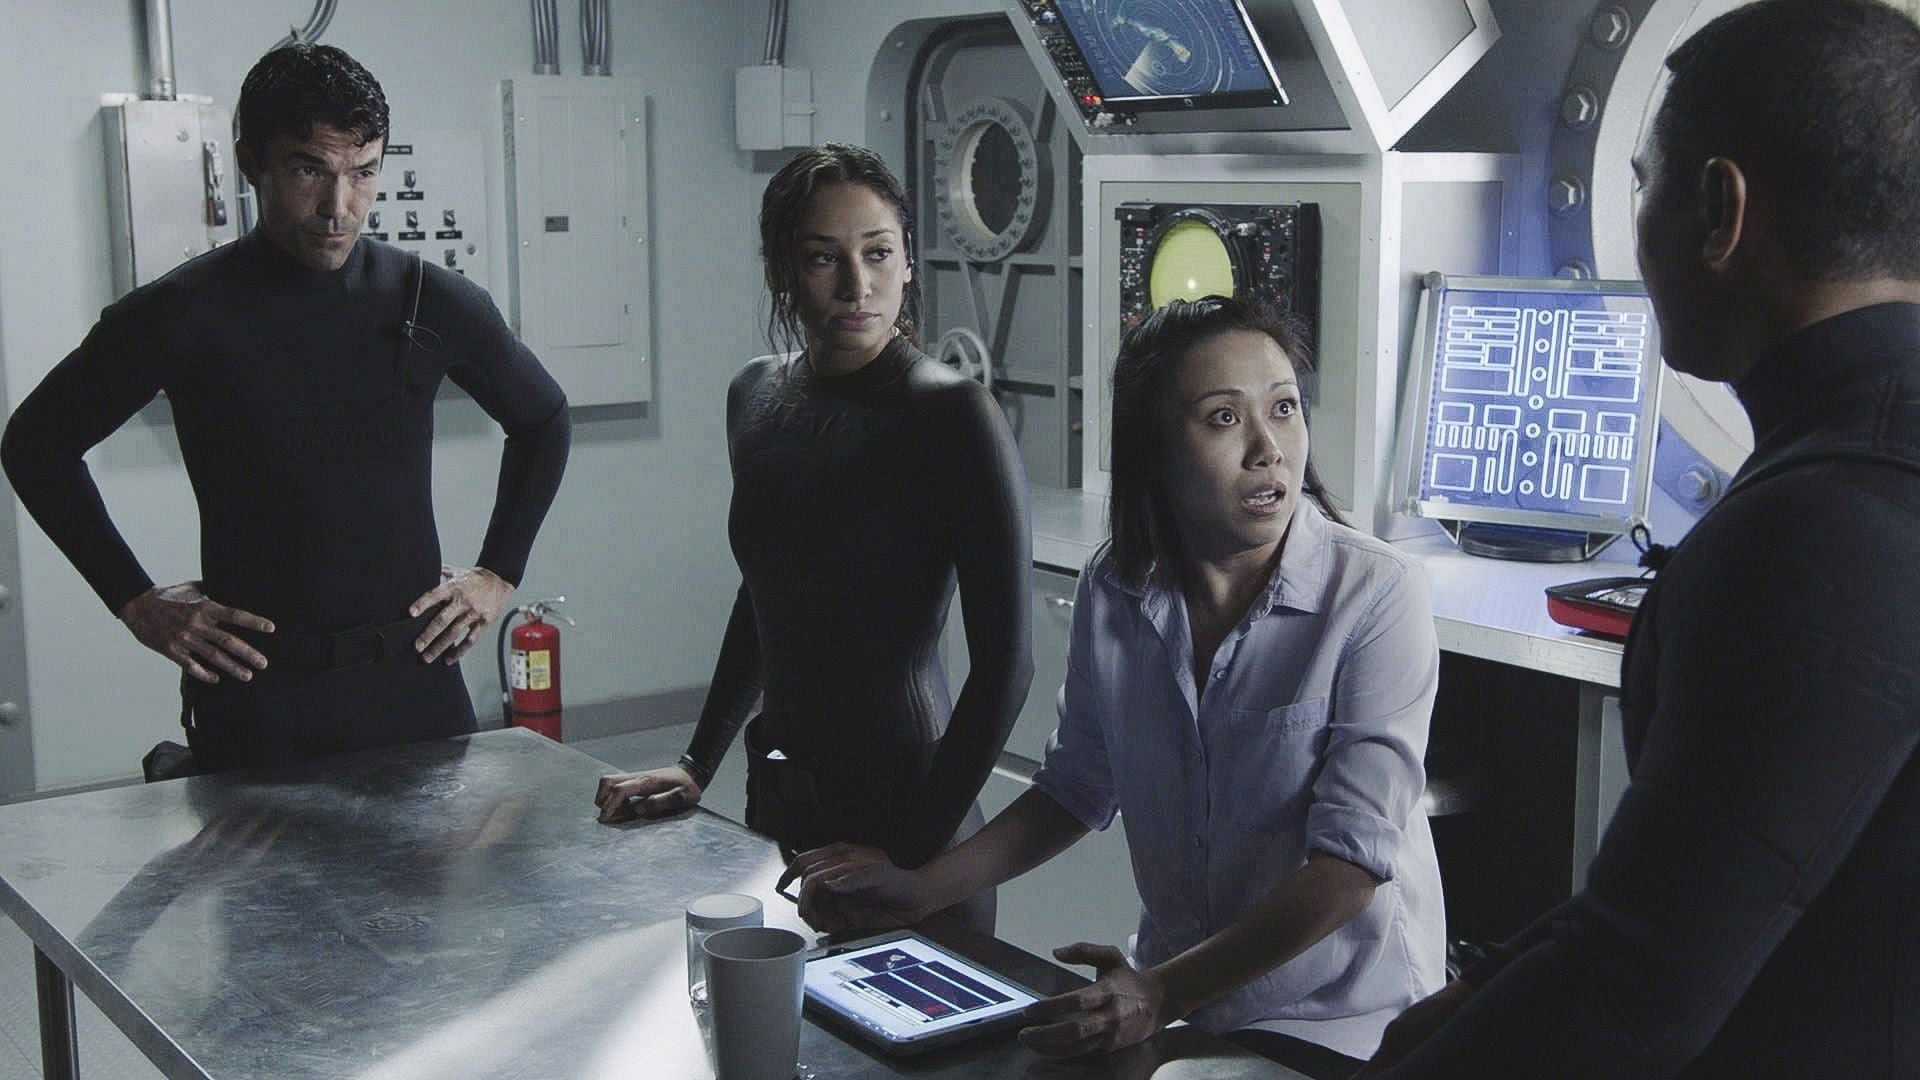 Hawaii Five-0 - Season 9 Episode 13 : Ke Iho Mai Nei Ko Luna (Those Above Are Descending)